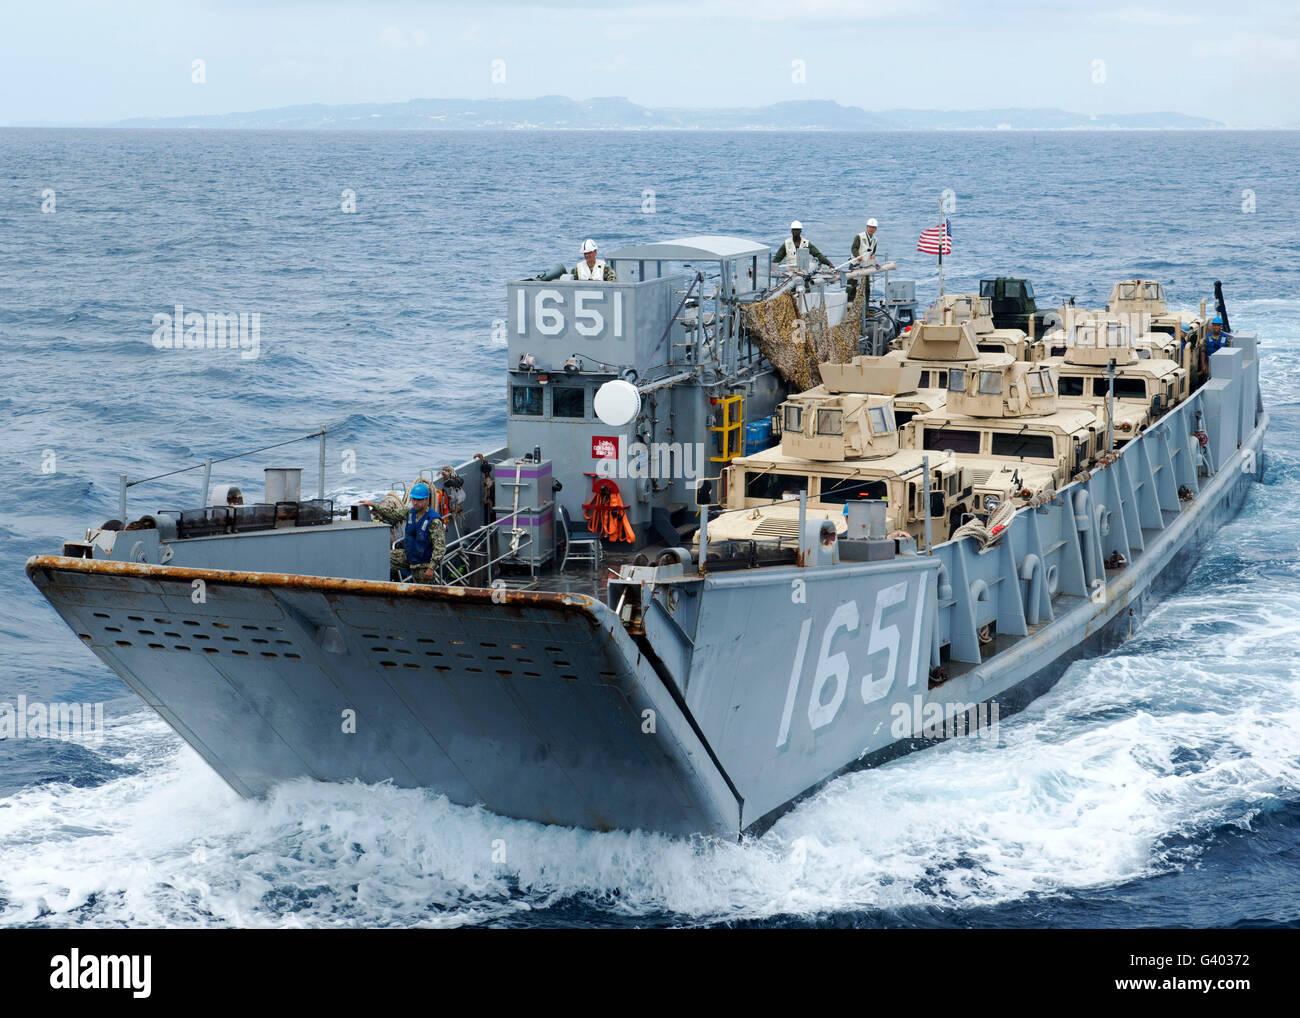 A landing craft utility ship. - Stock Image